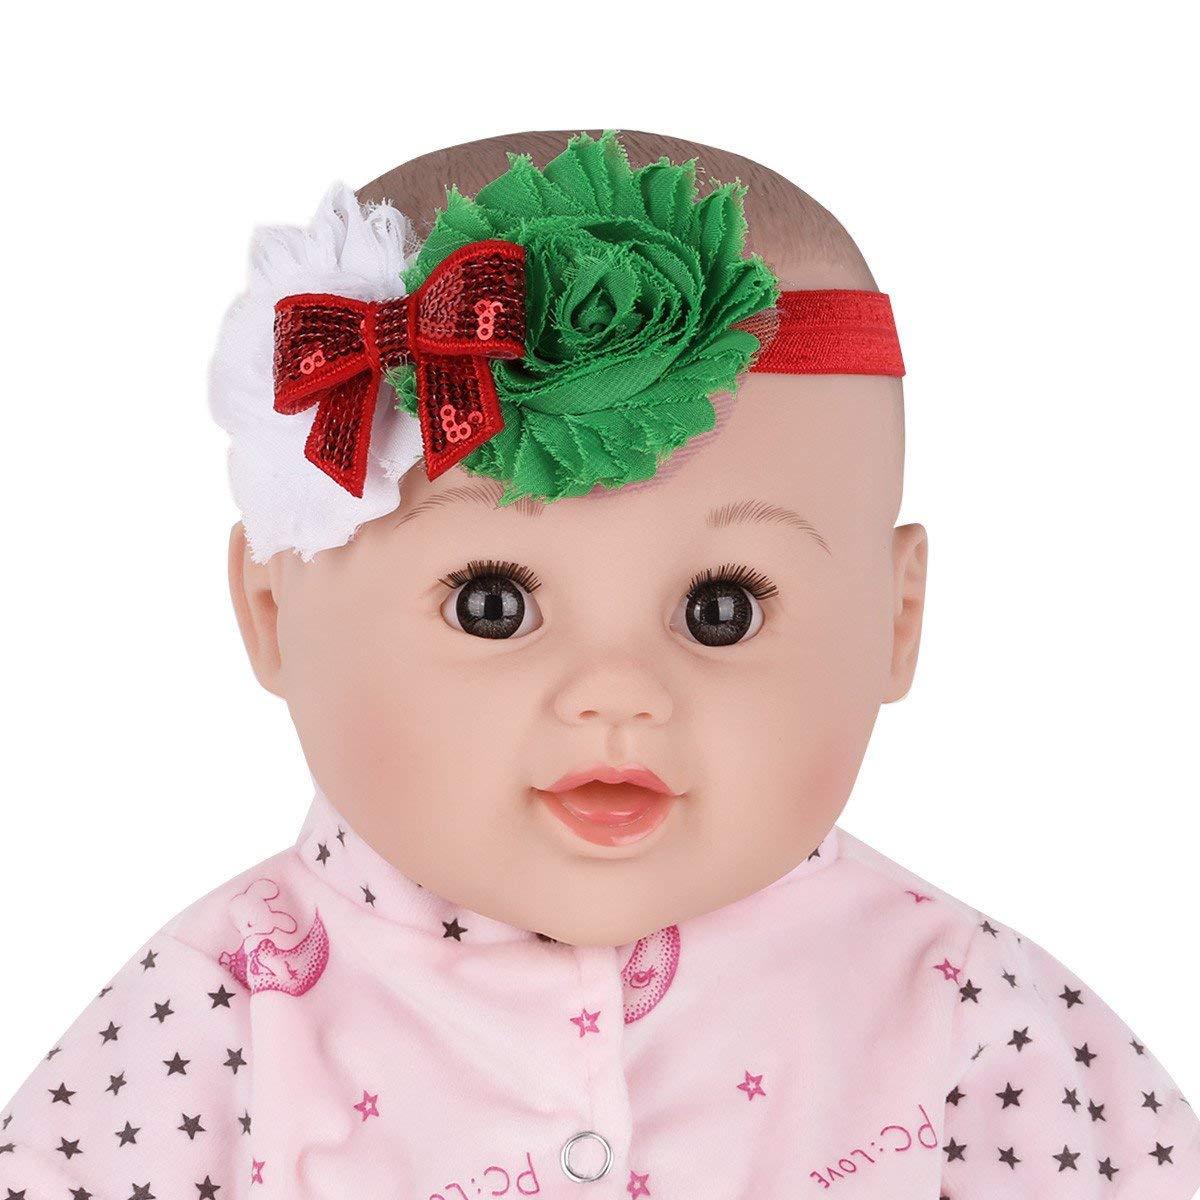 Freebily Set of 3 Infant Baby Girls Christmas Flower Shiny Bowknot Headbands Hair Bands